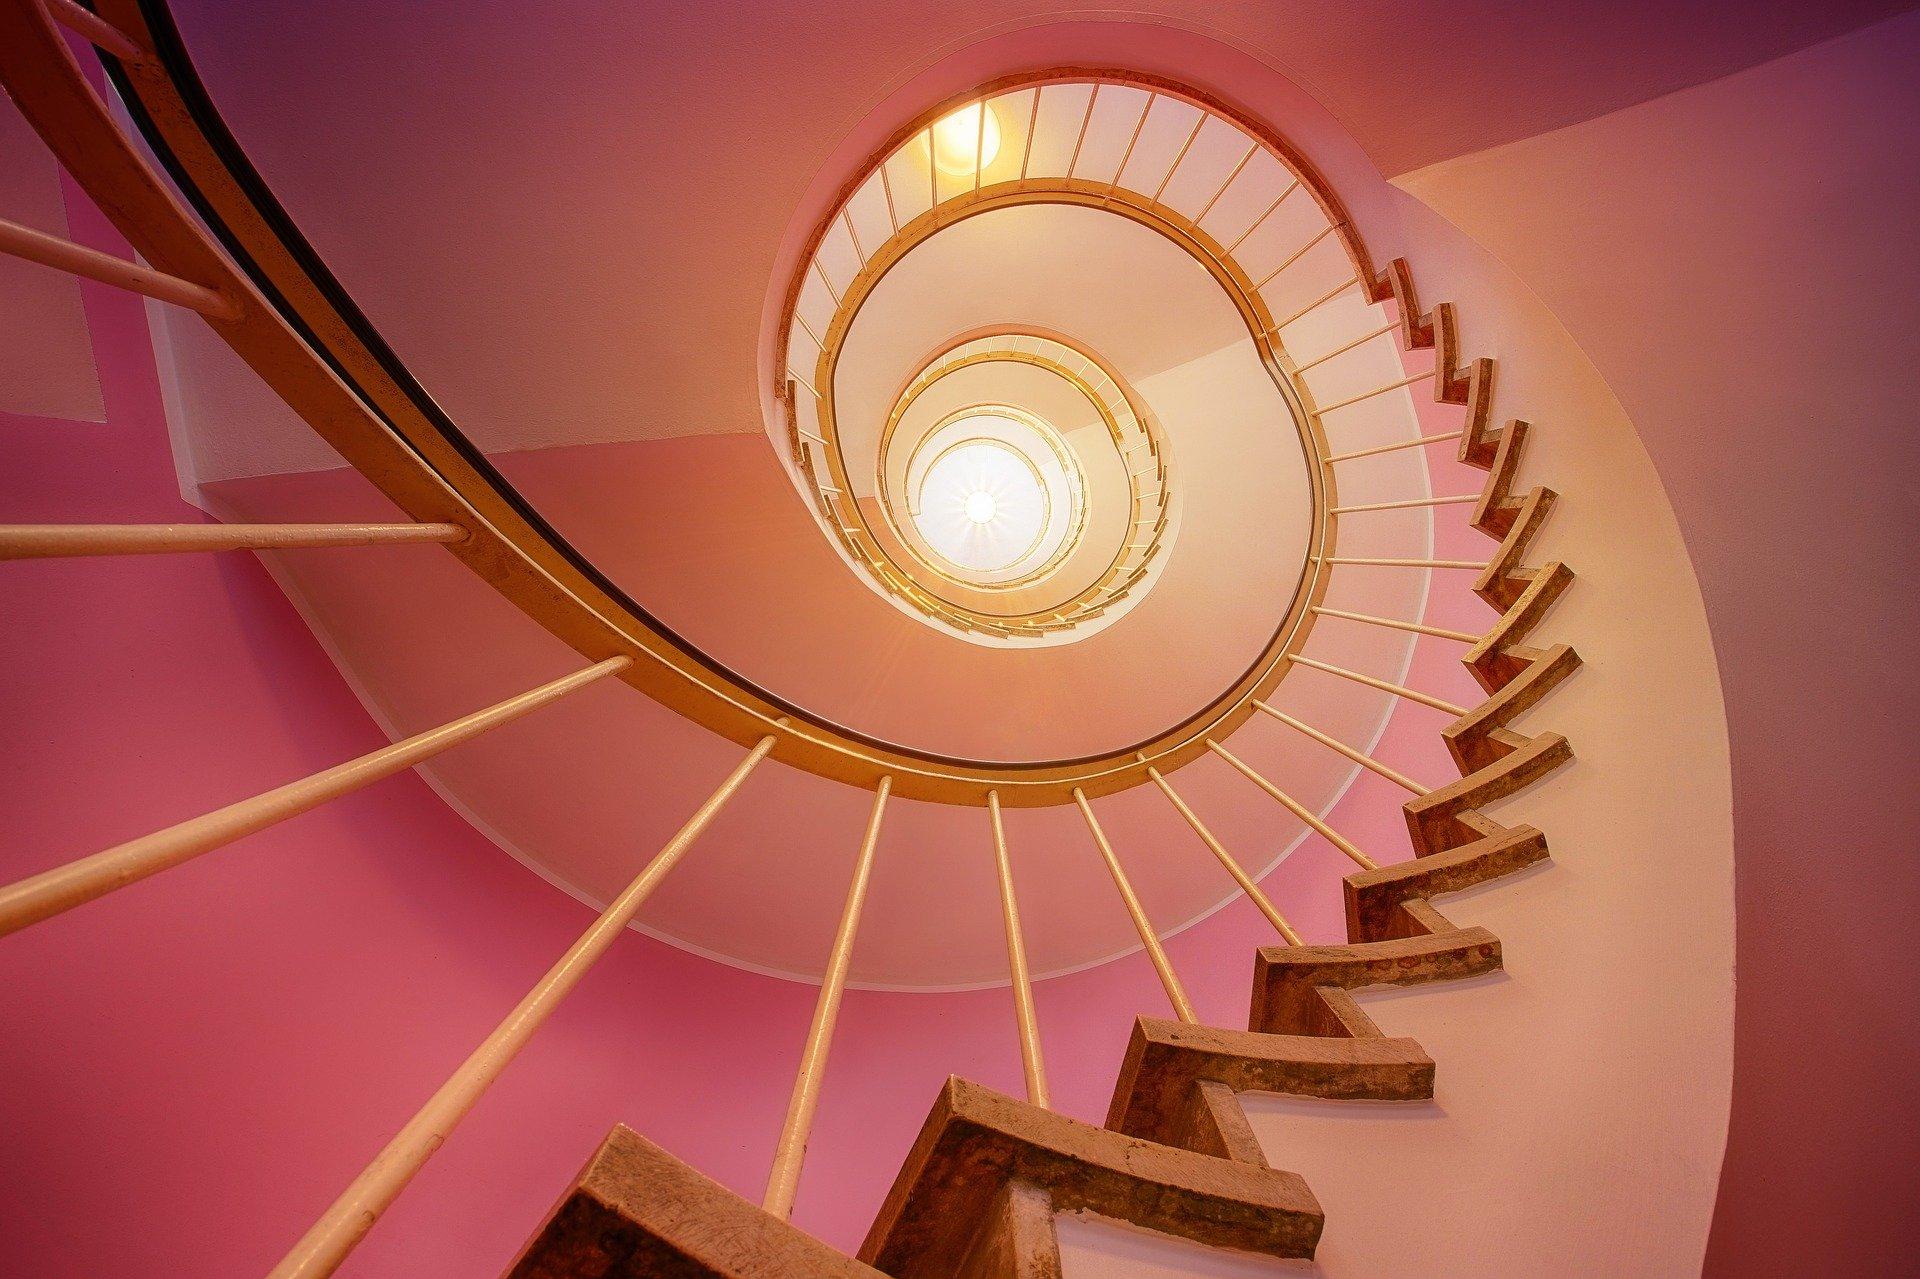 Dit is hoe spirituele groei hoort te werken ♥ Marilyn Raffaele ♥ Lichtwerkers Nederland